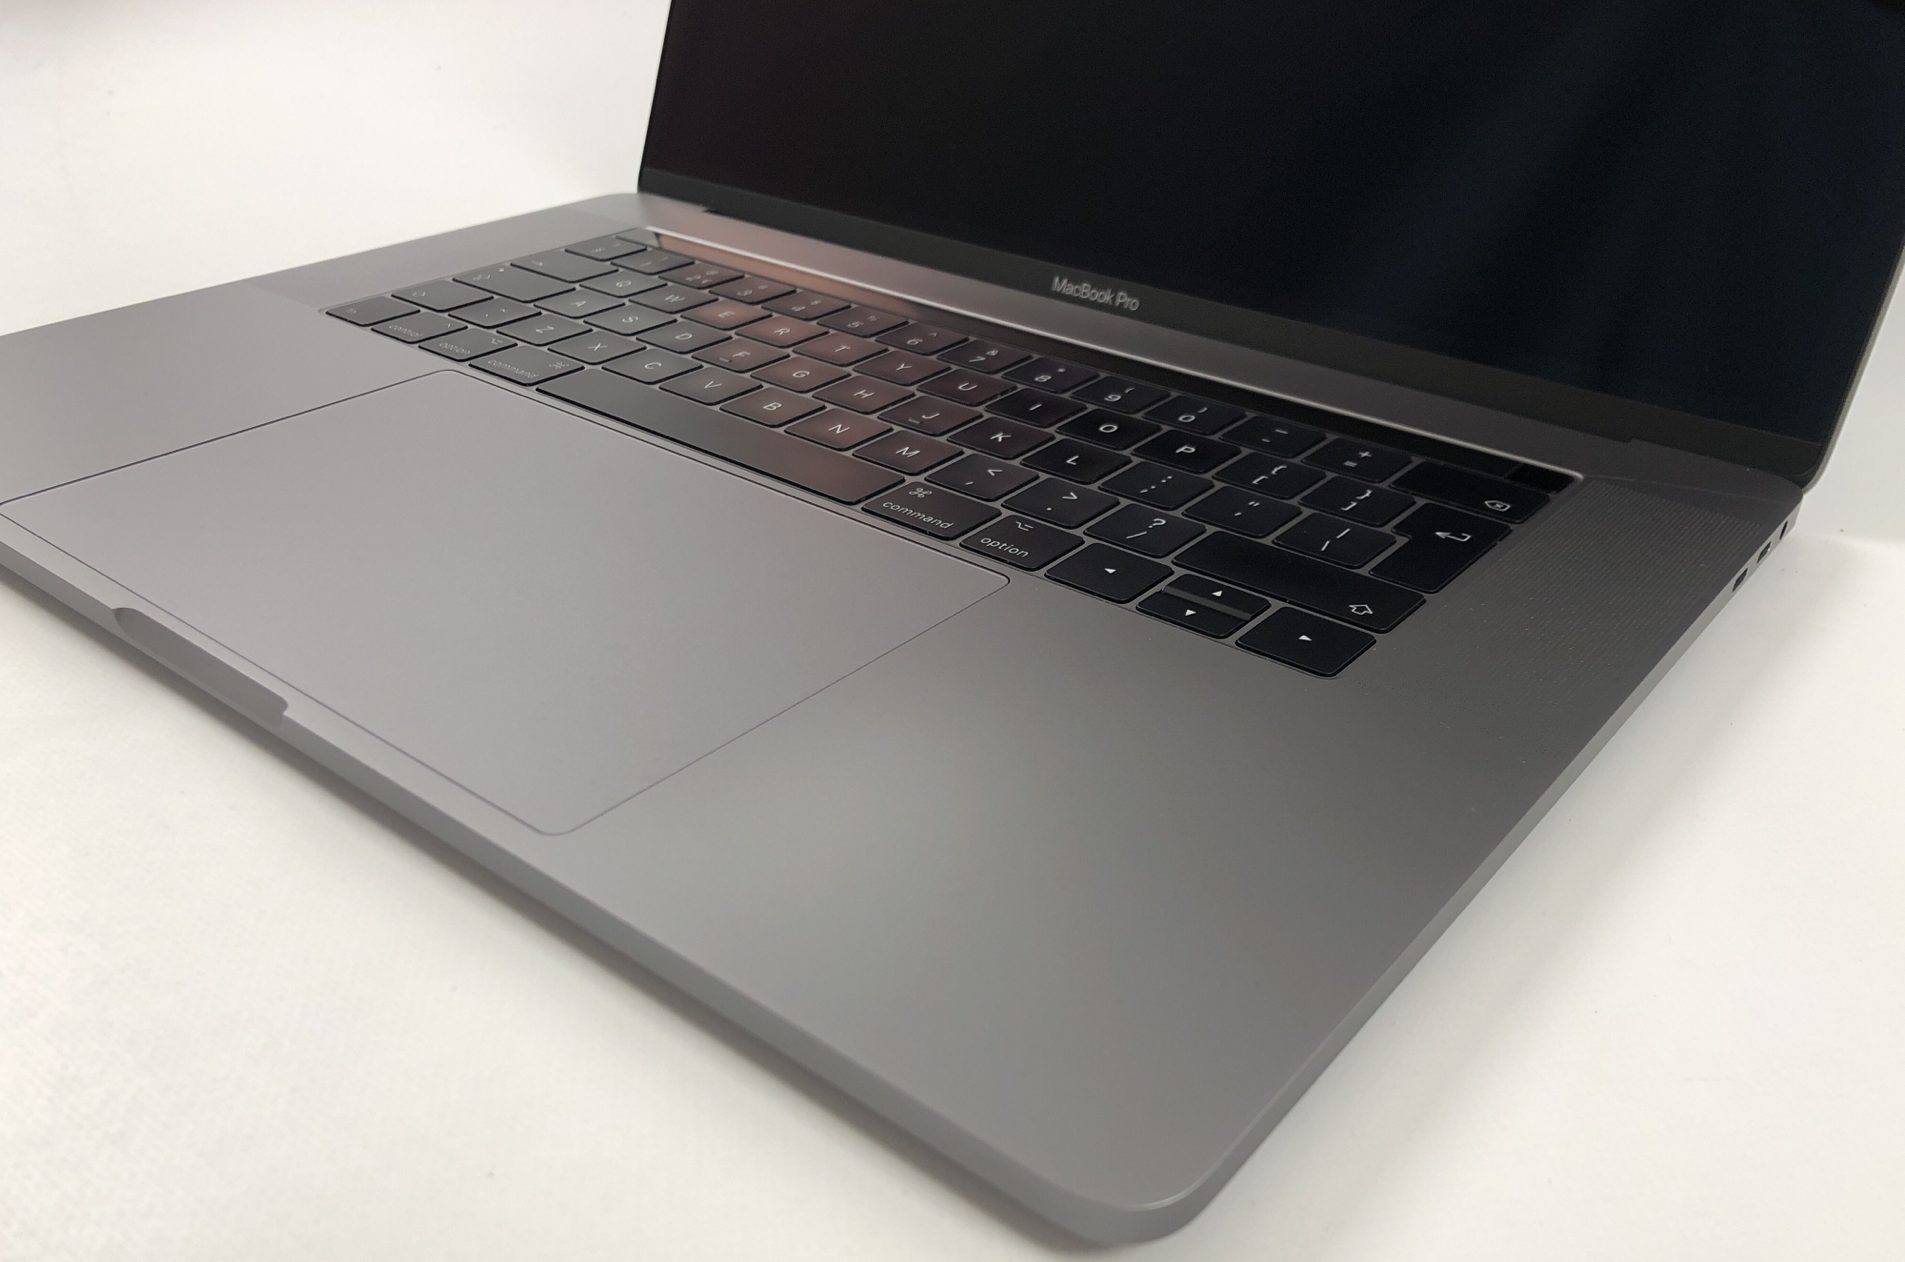 "MacBook Pro 15"" Touch Bar Late 2016 (Intel Quad-Core i7 2.7 GHz 16 GB RAM 512 GB SSD), Space Gray, Intel Quad-Core i7 2.7 GHz, 16 GB RAM, 512 GB SSD, image 3"